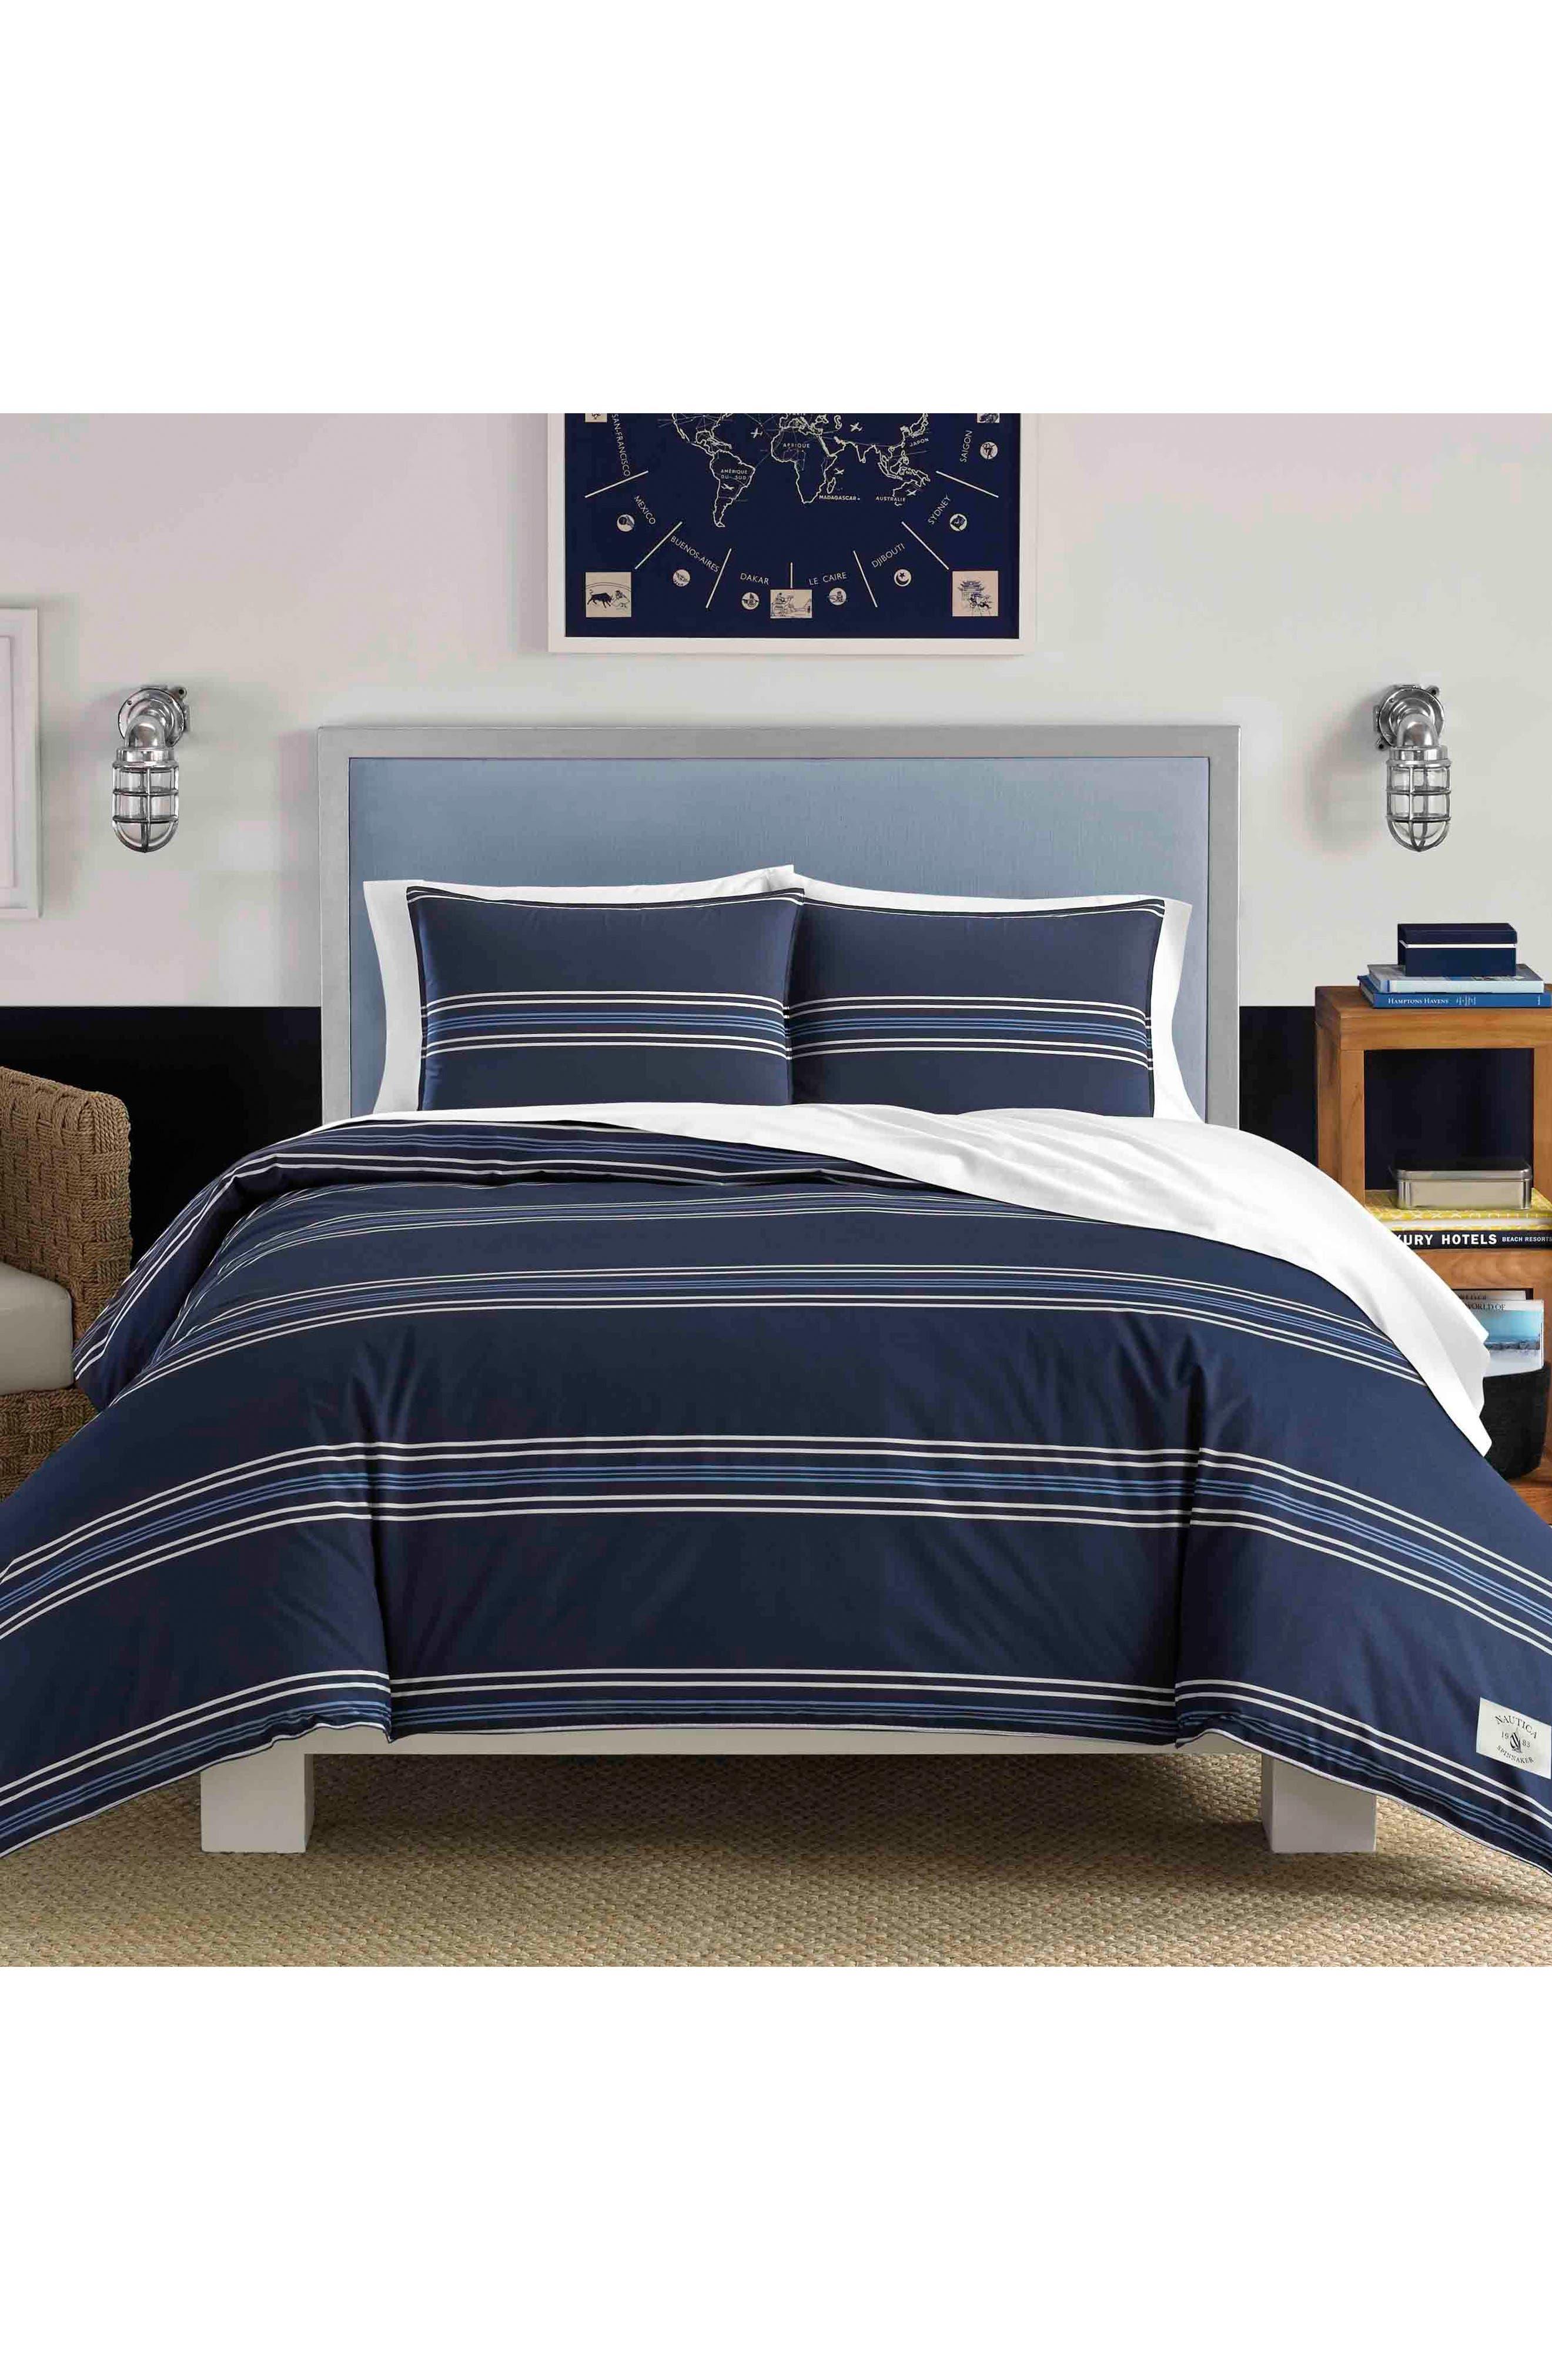 NAUTICA, Acton Comforter & Sham Set, Main thumbnail 1, color, NAVY